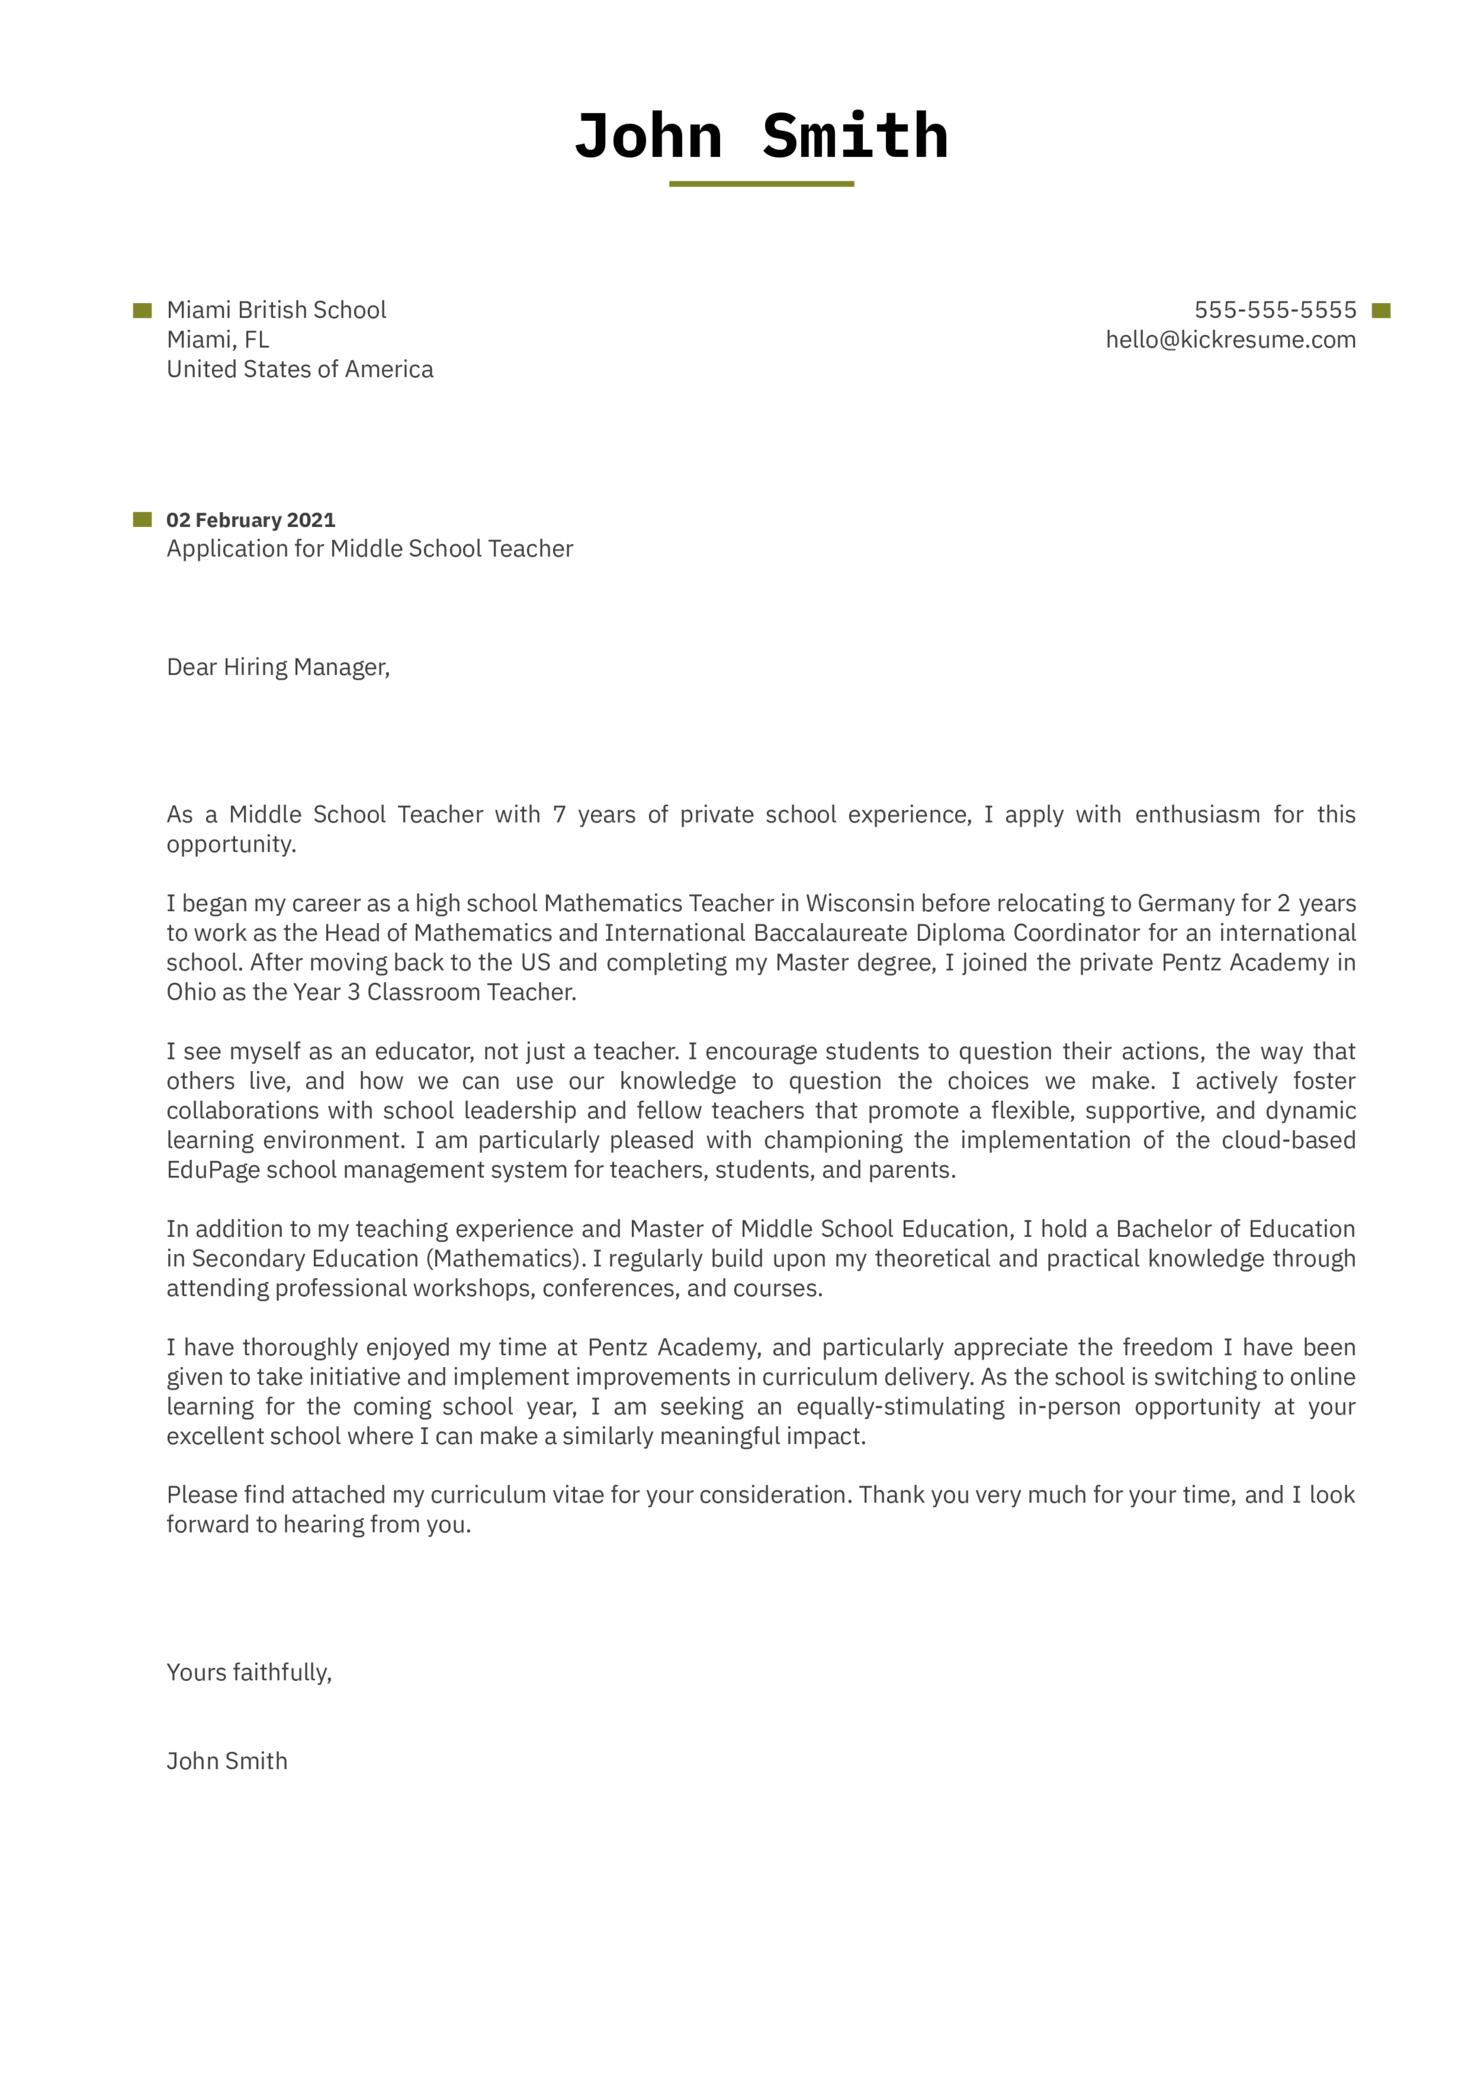 Private School Teacher Cover Letter Example